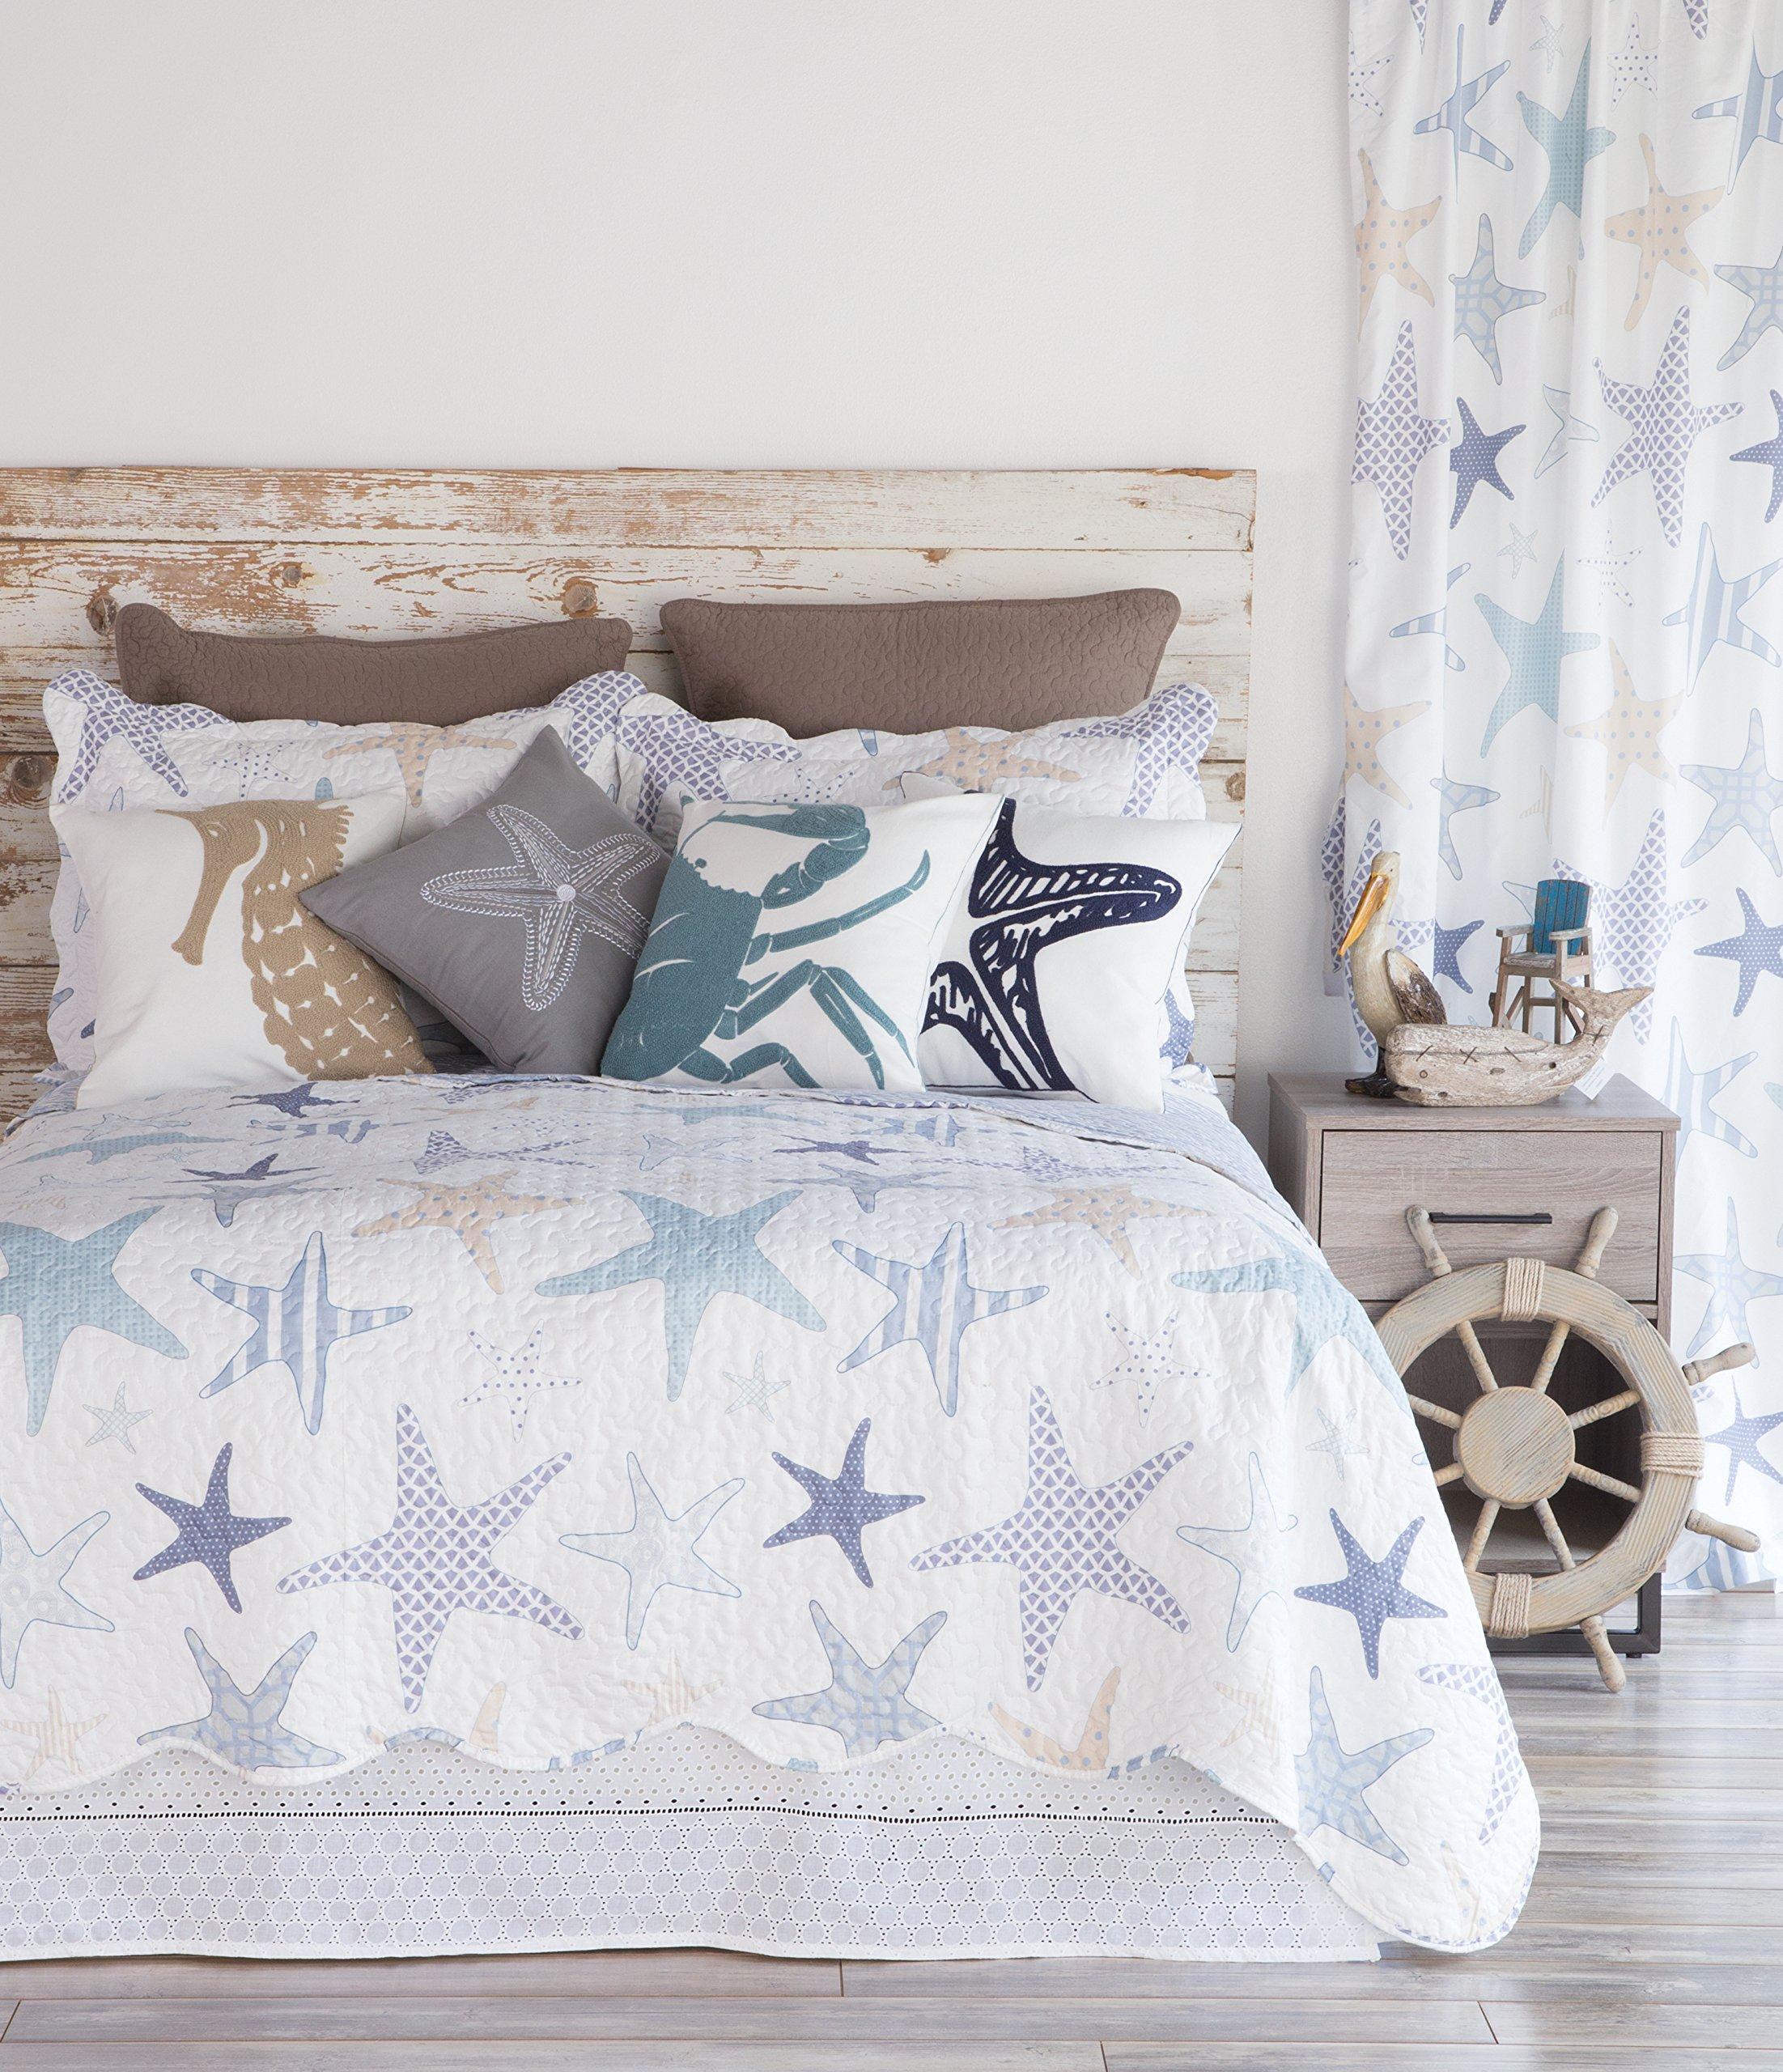 North End Decor Starfish Reef Coastal Quilt, Queen 3-Piece Bedding Sets, 92''x96'', White